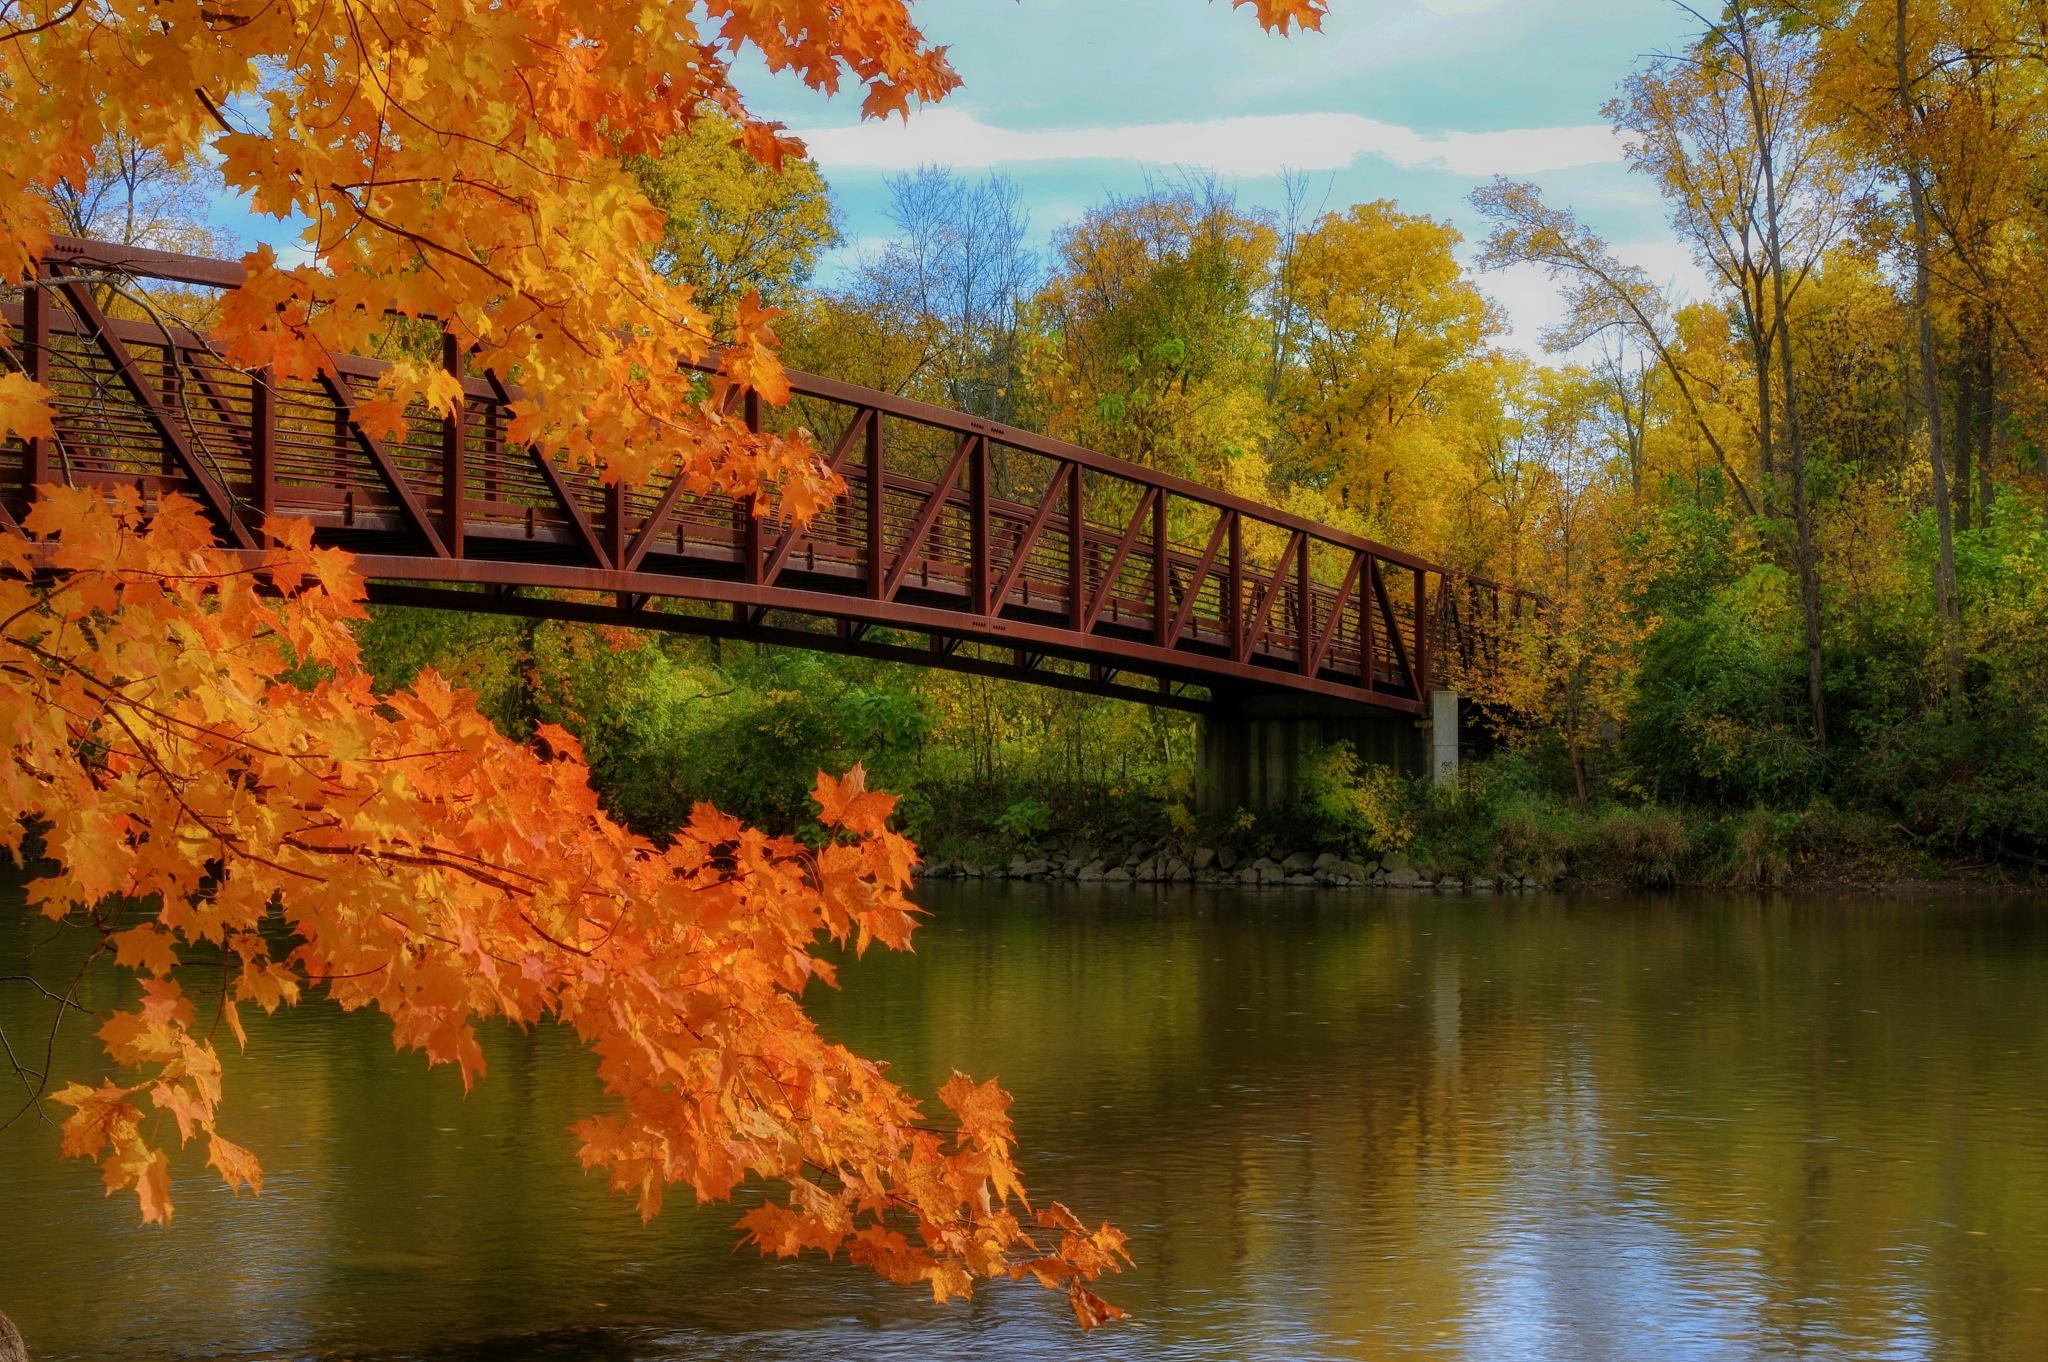 Autumn along the River by Gary O'Boyle